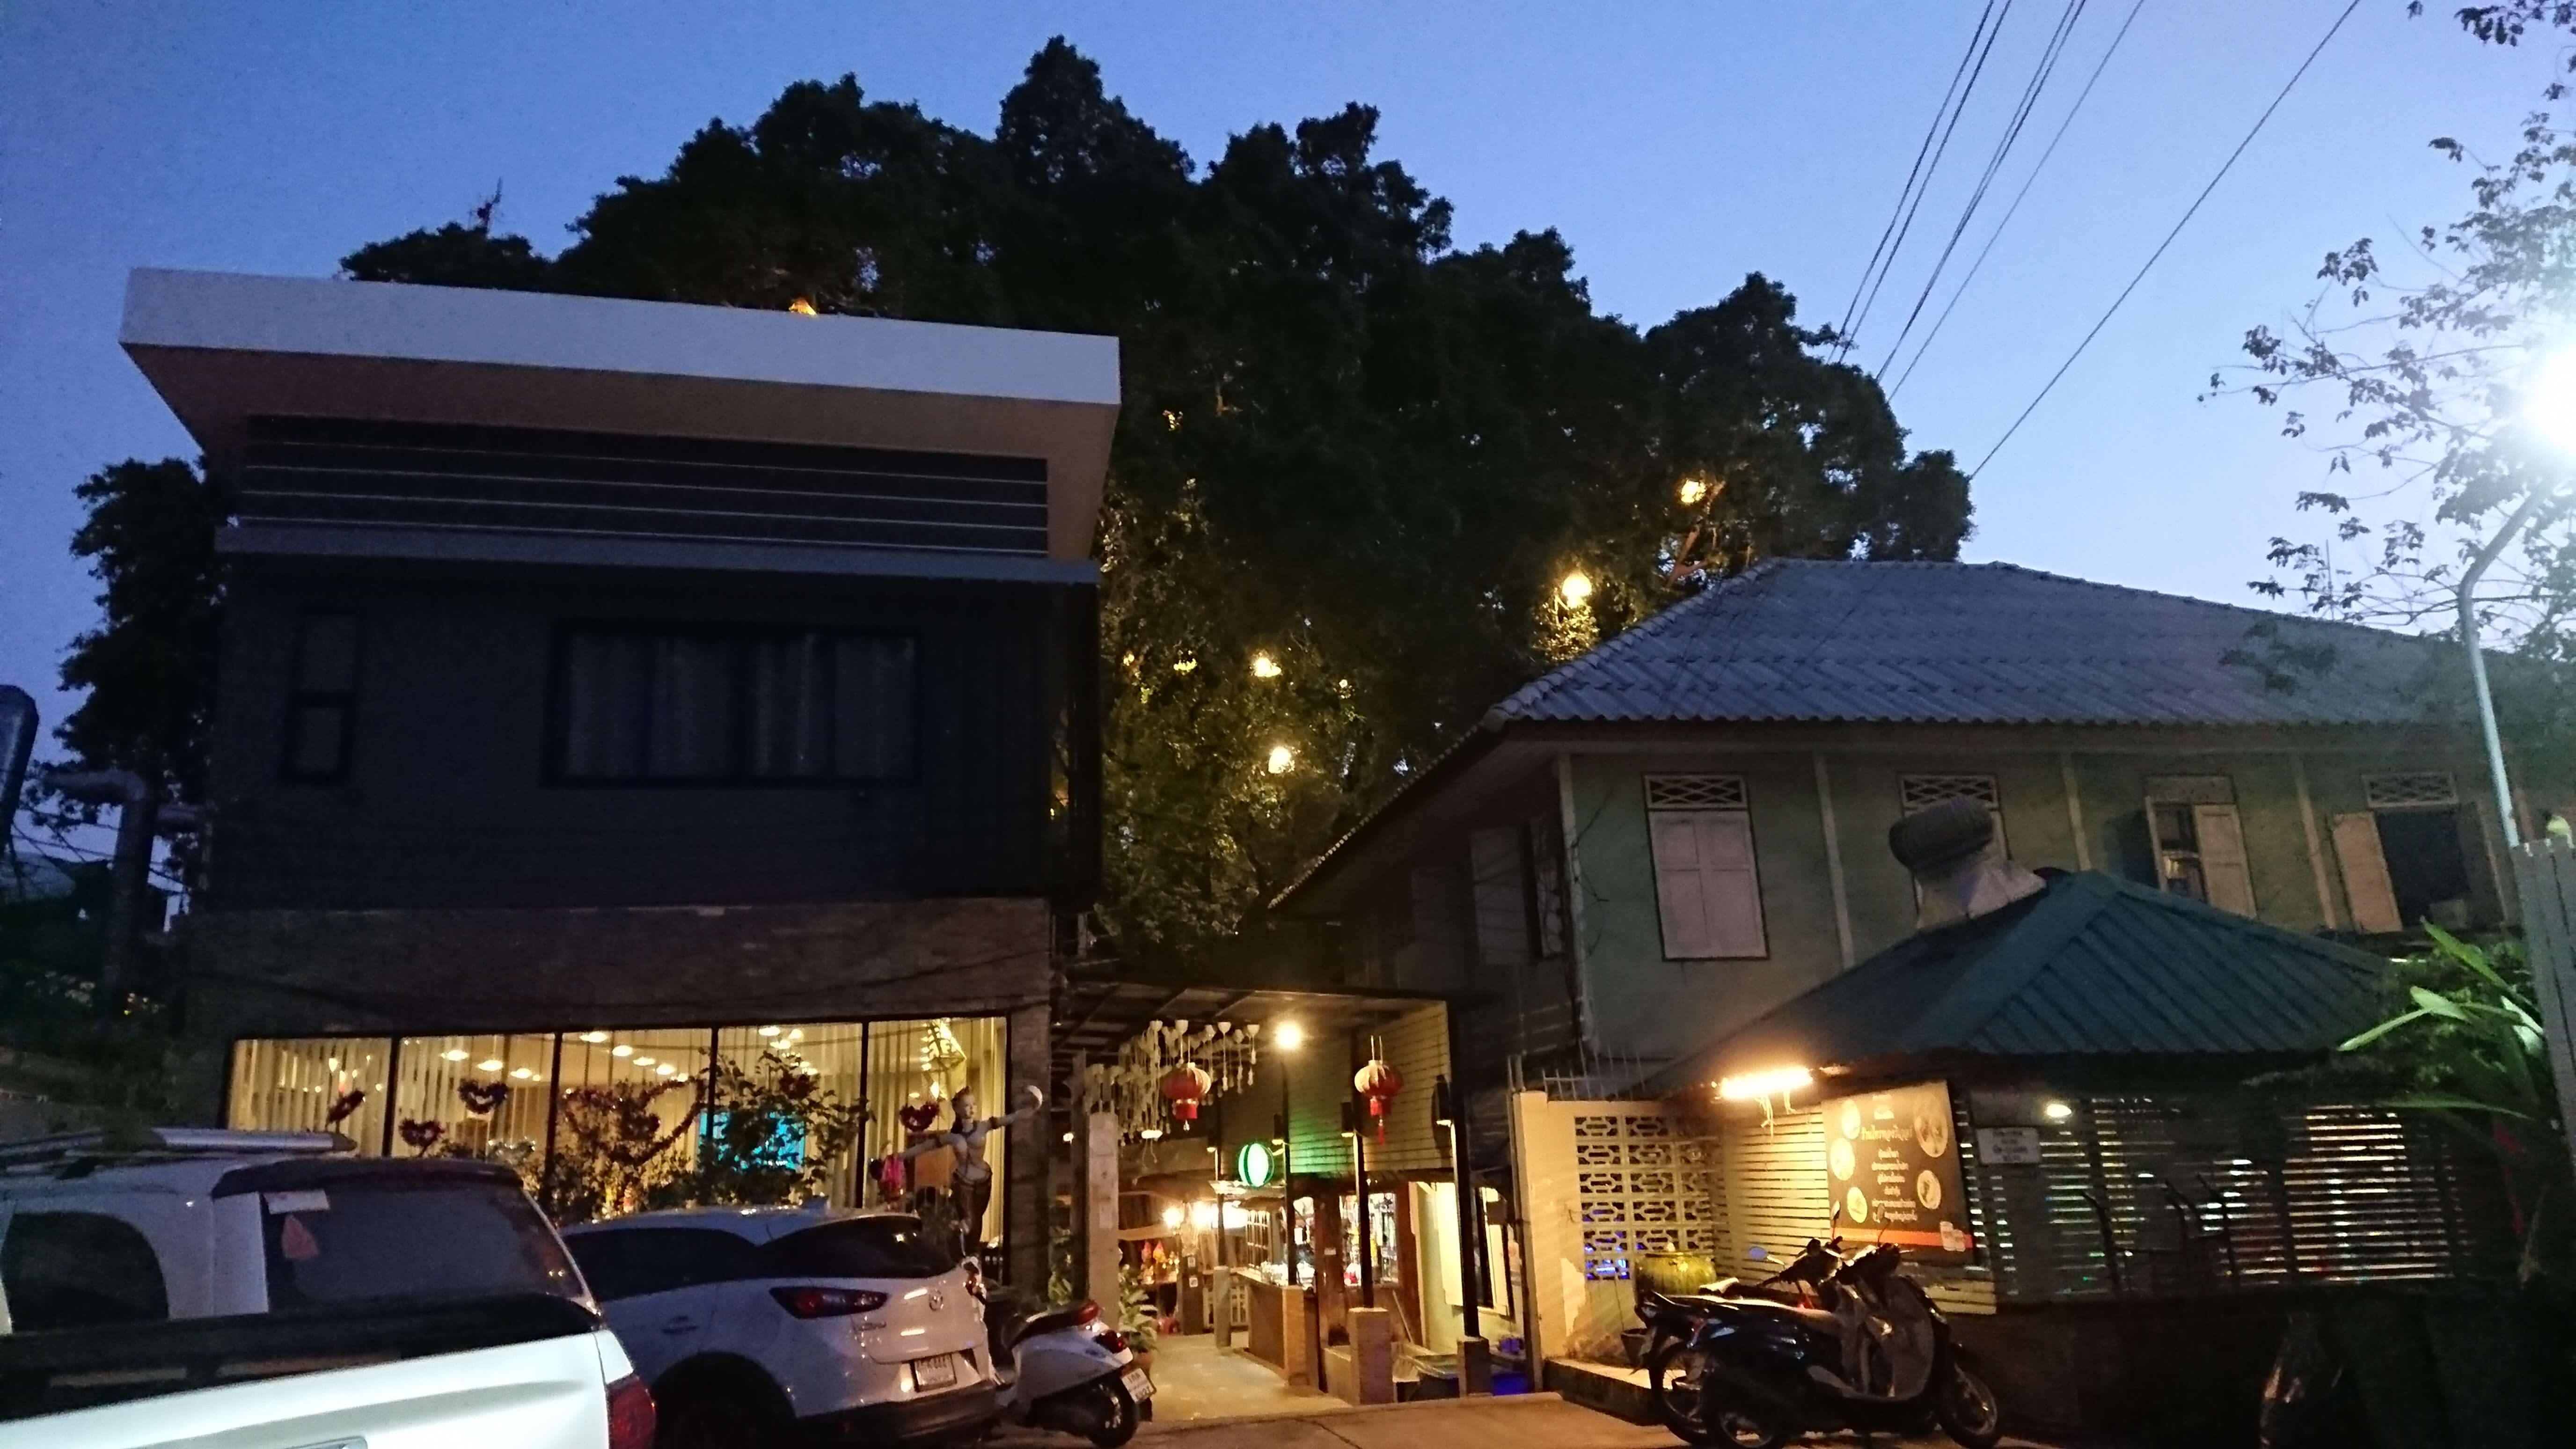 Sai Thong Restaurant(サイトーン レストラン) / チャオプラヤー川を見ながら美味しいタイ料理に舌鼓